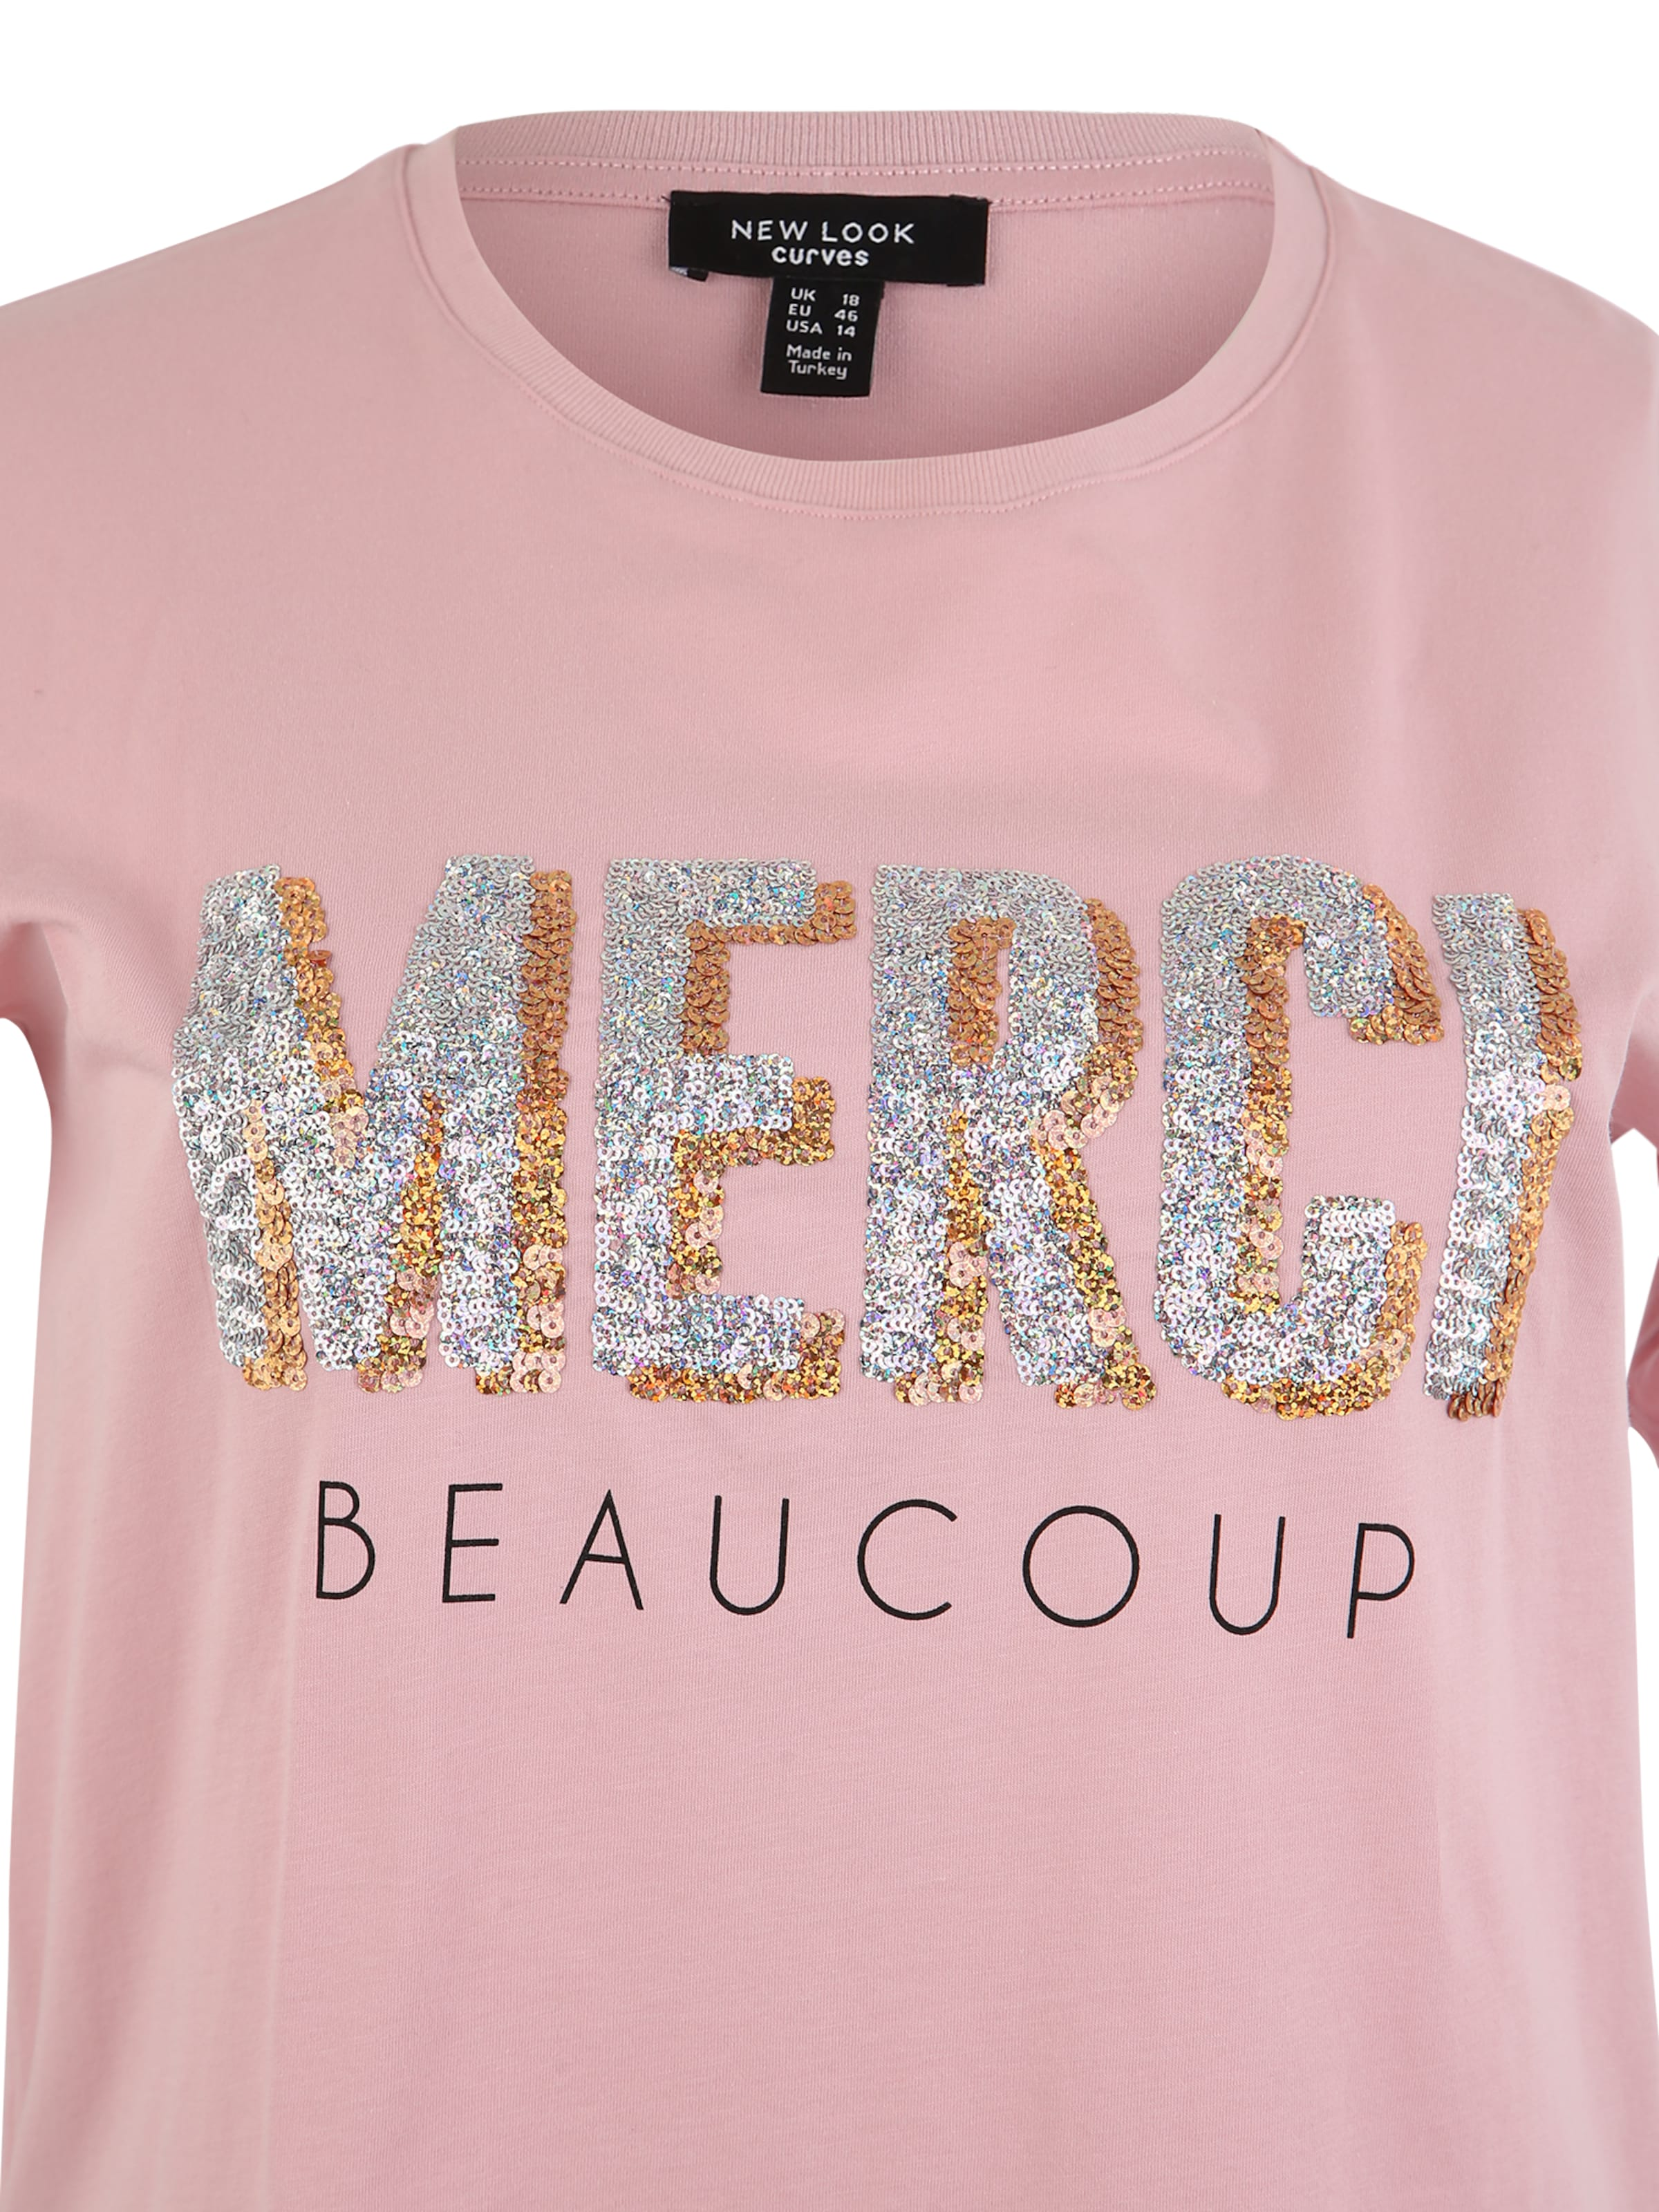 Beacoup En NudeBleu 'x Merci Look New Sequin' Curves T shirt Rose FcuK1JlT3